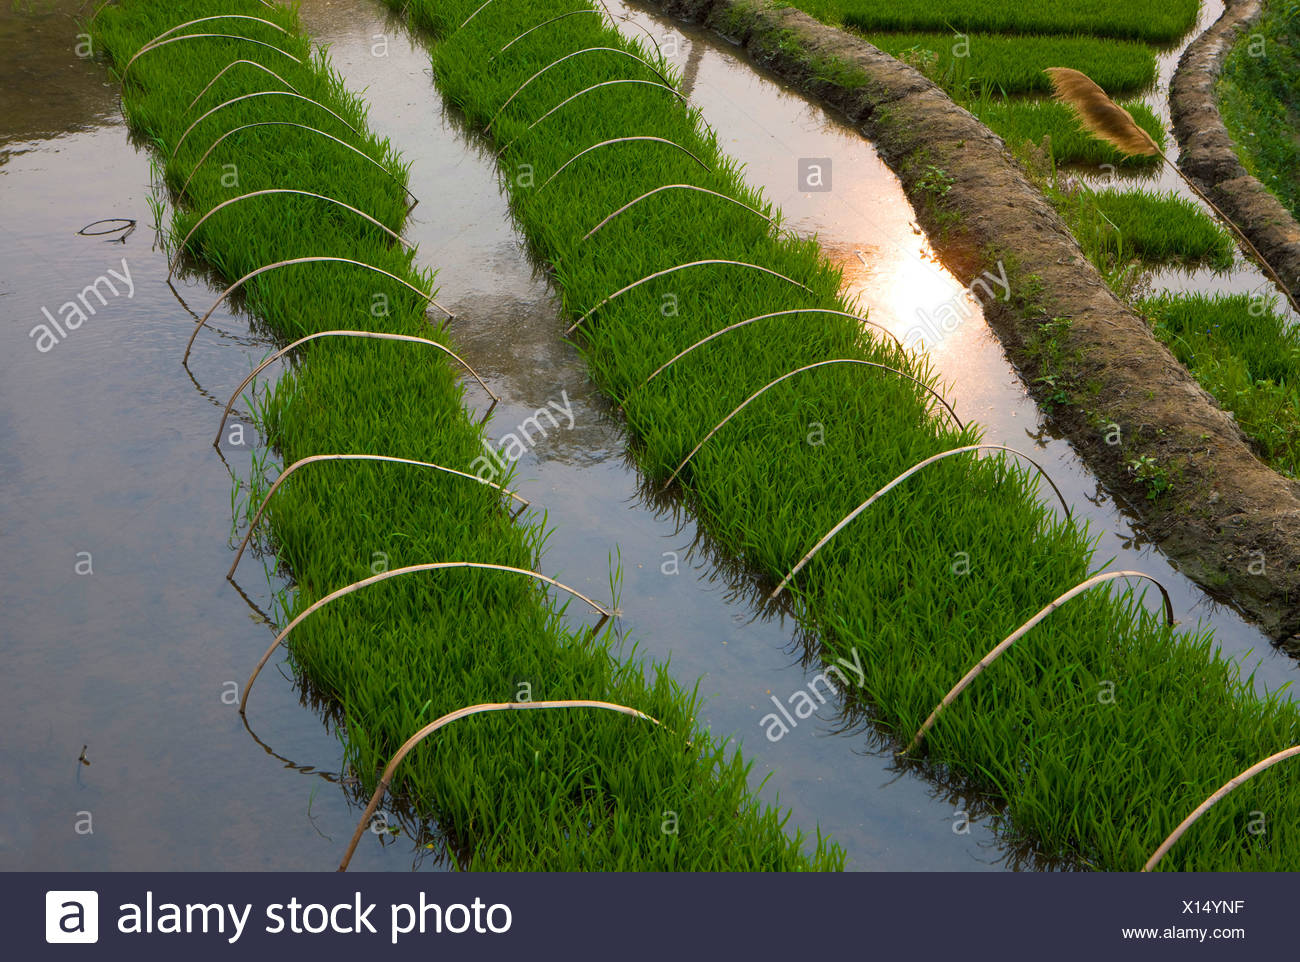 Yuanyang China Asia Terrazas De Arroz Cultivo De Arroz